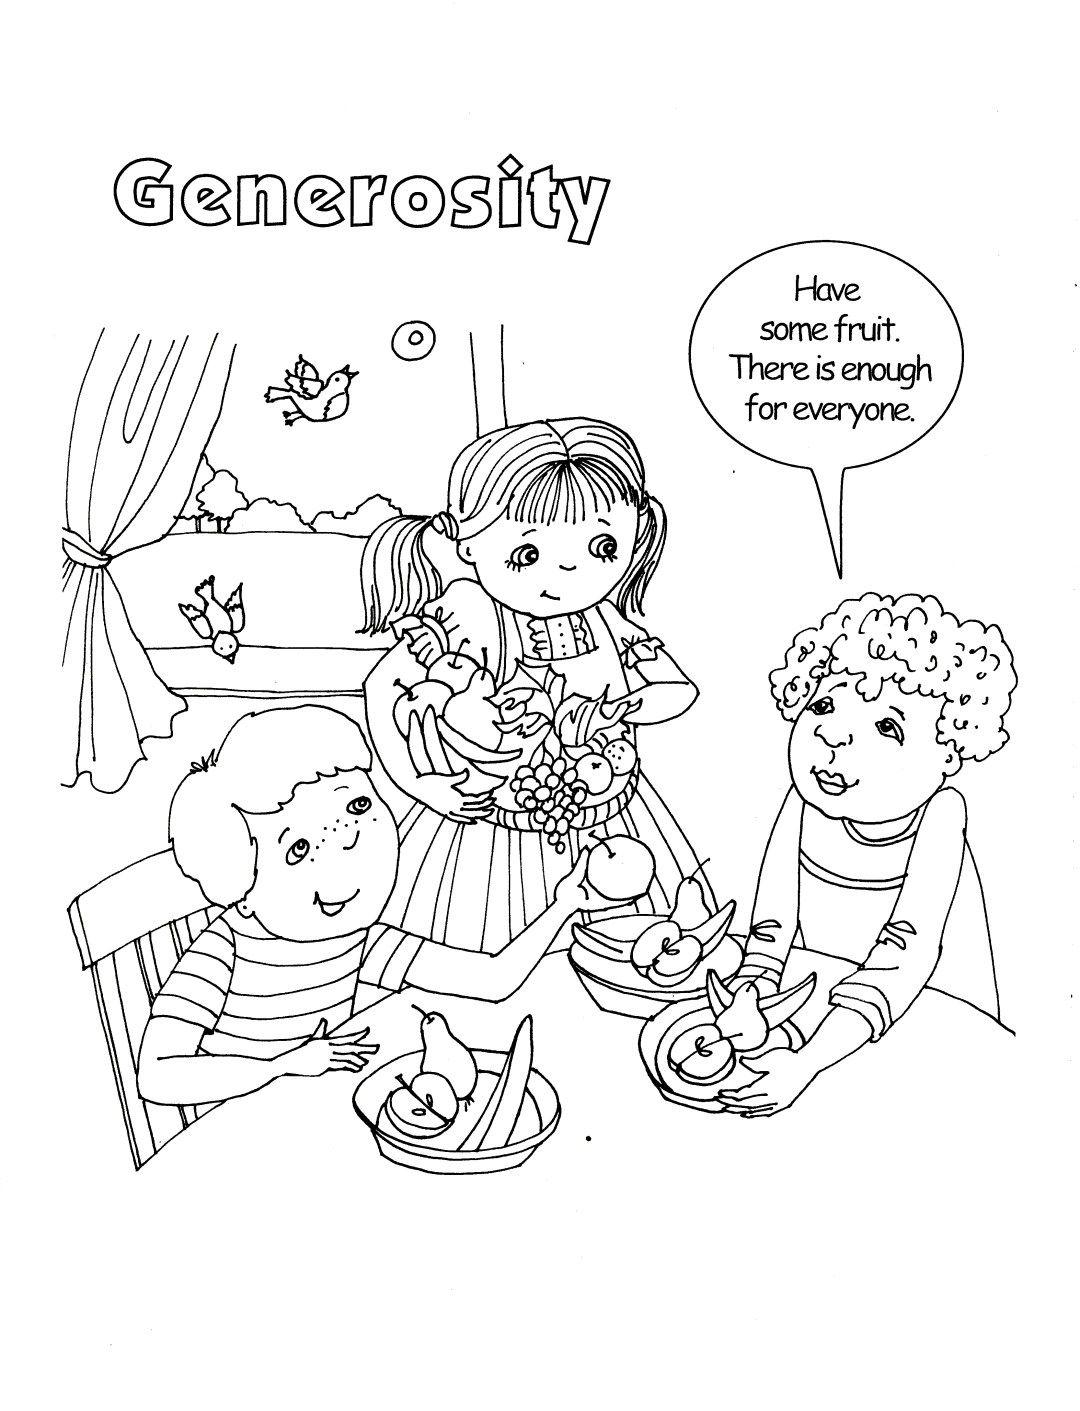 Generosity Coloring Sheet | Baha'i Holy Days | Coloring ...